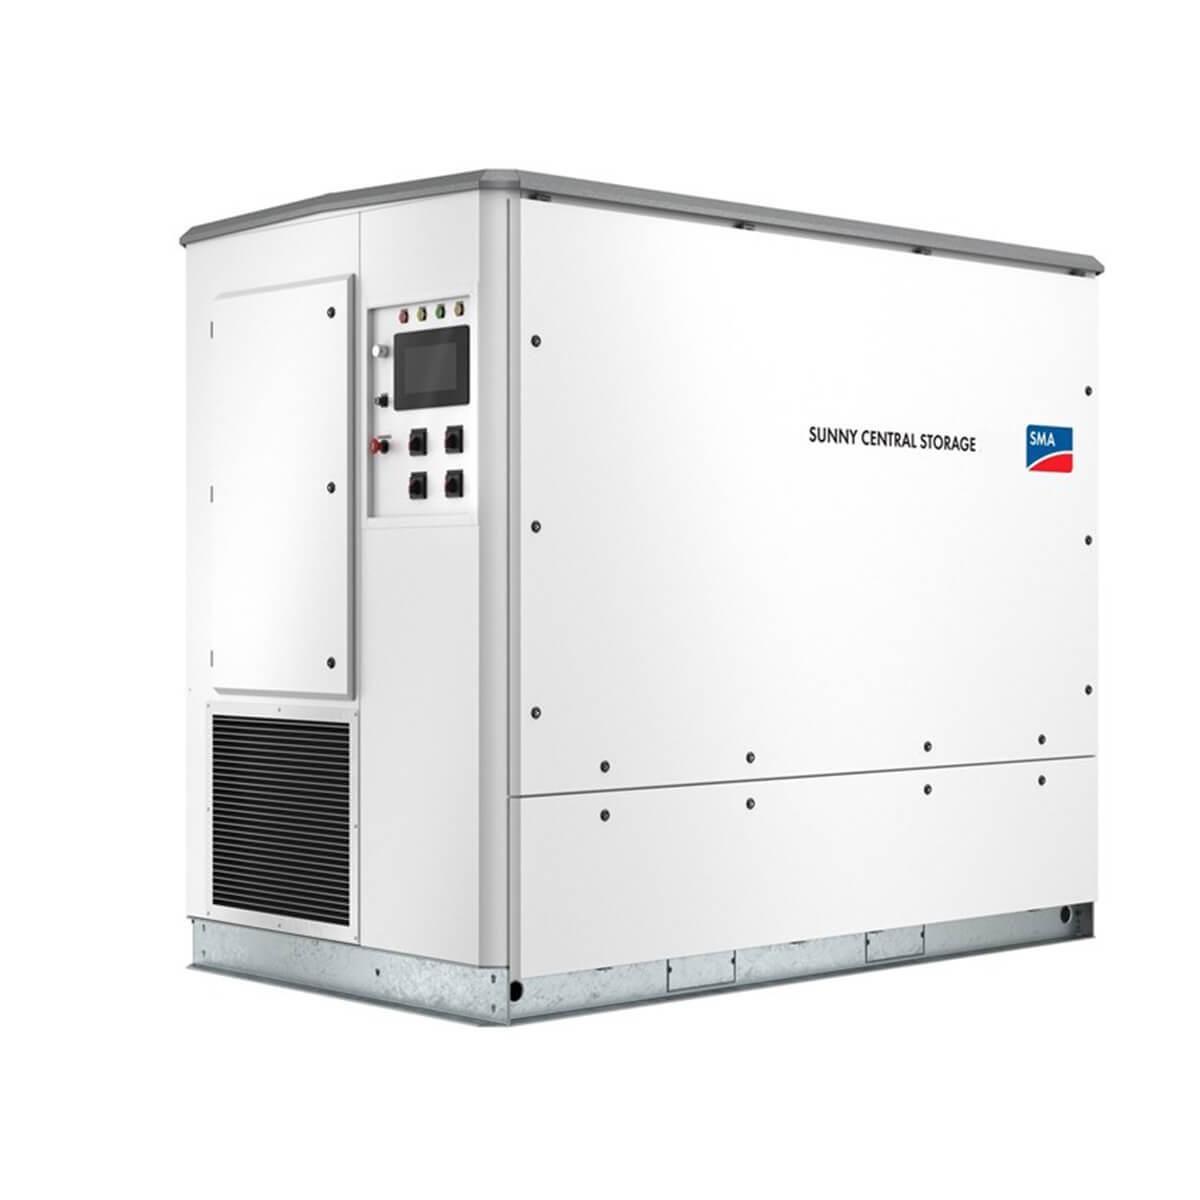 sma 2200kW inverter, sma sunny central 2200kW inverter, sma sunny central 2200 inverter, sma sunny central 2200, sma sunny central 2200 kW, SMA 2200KW